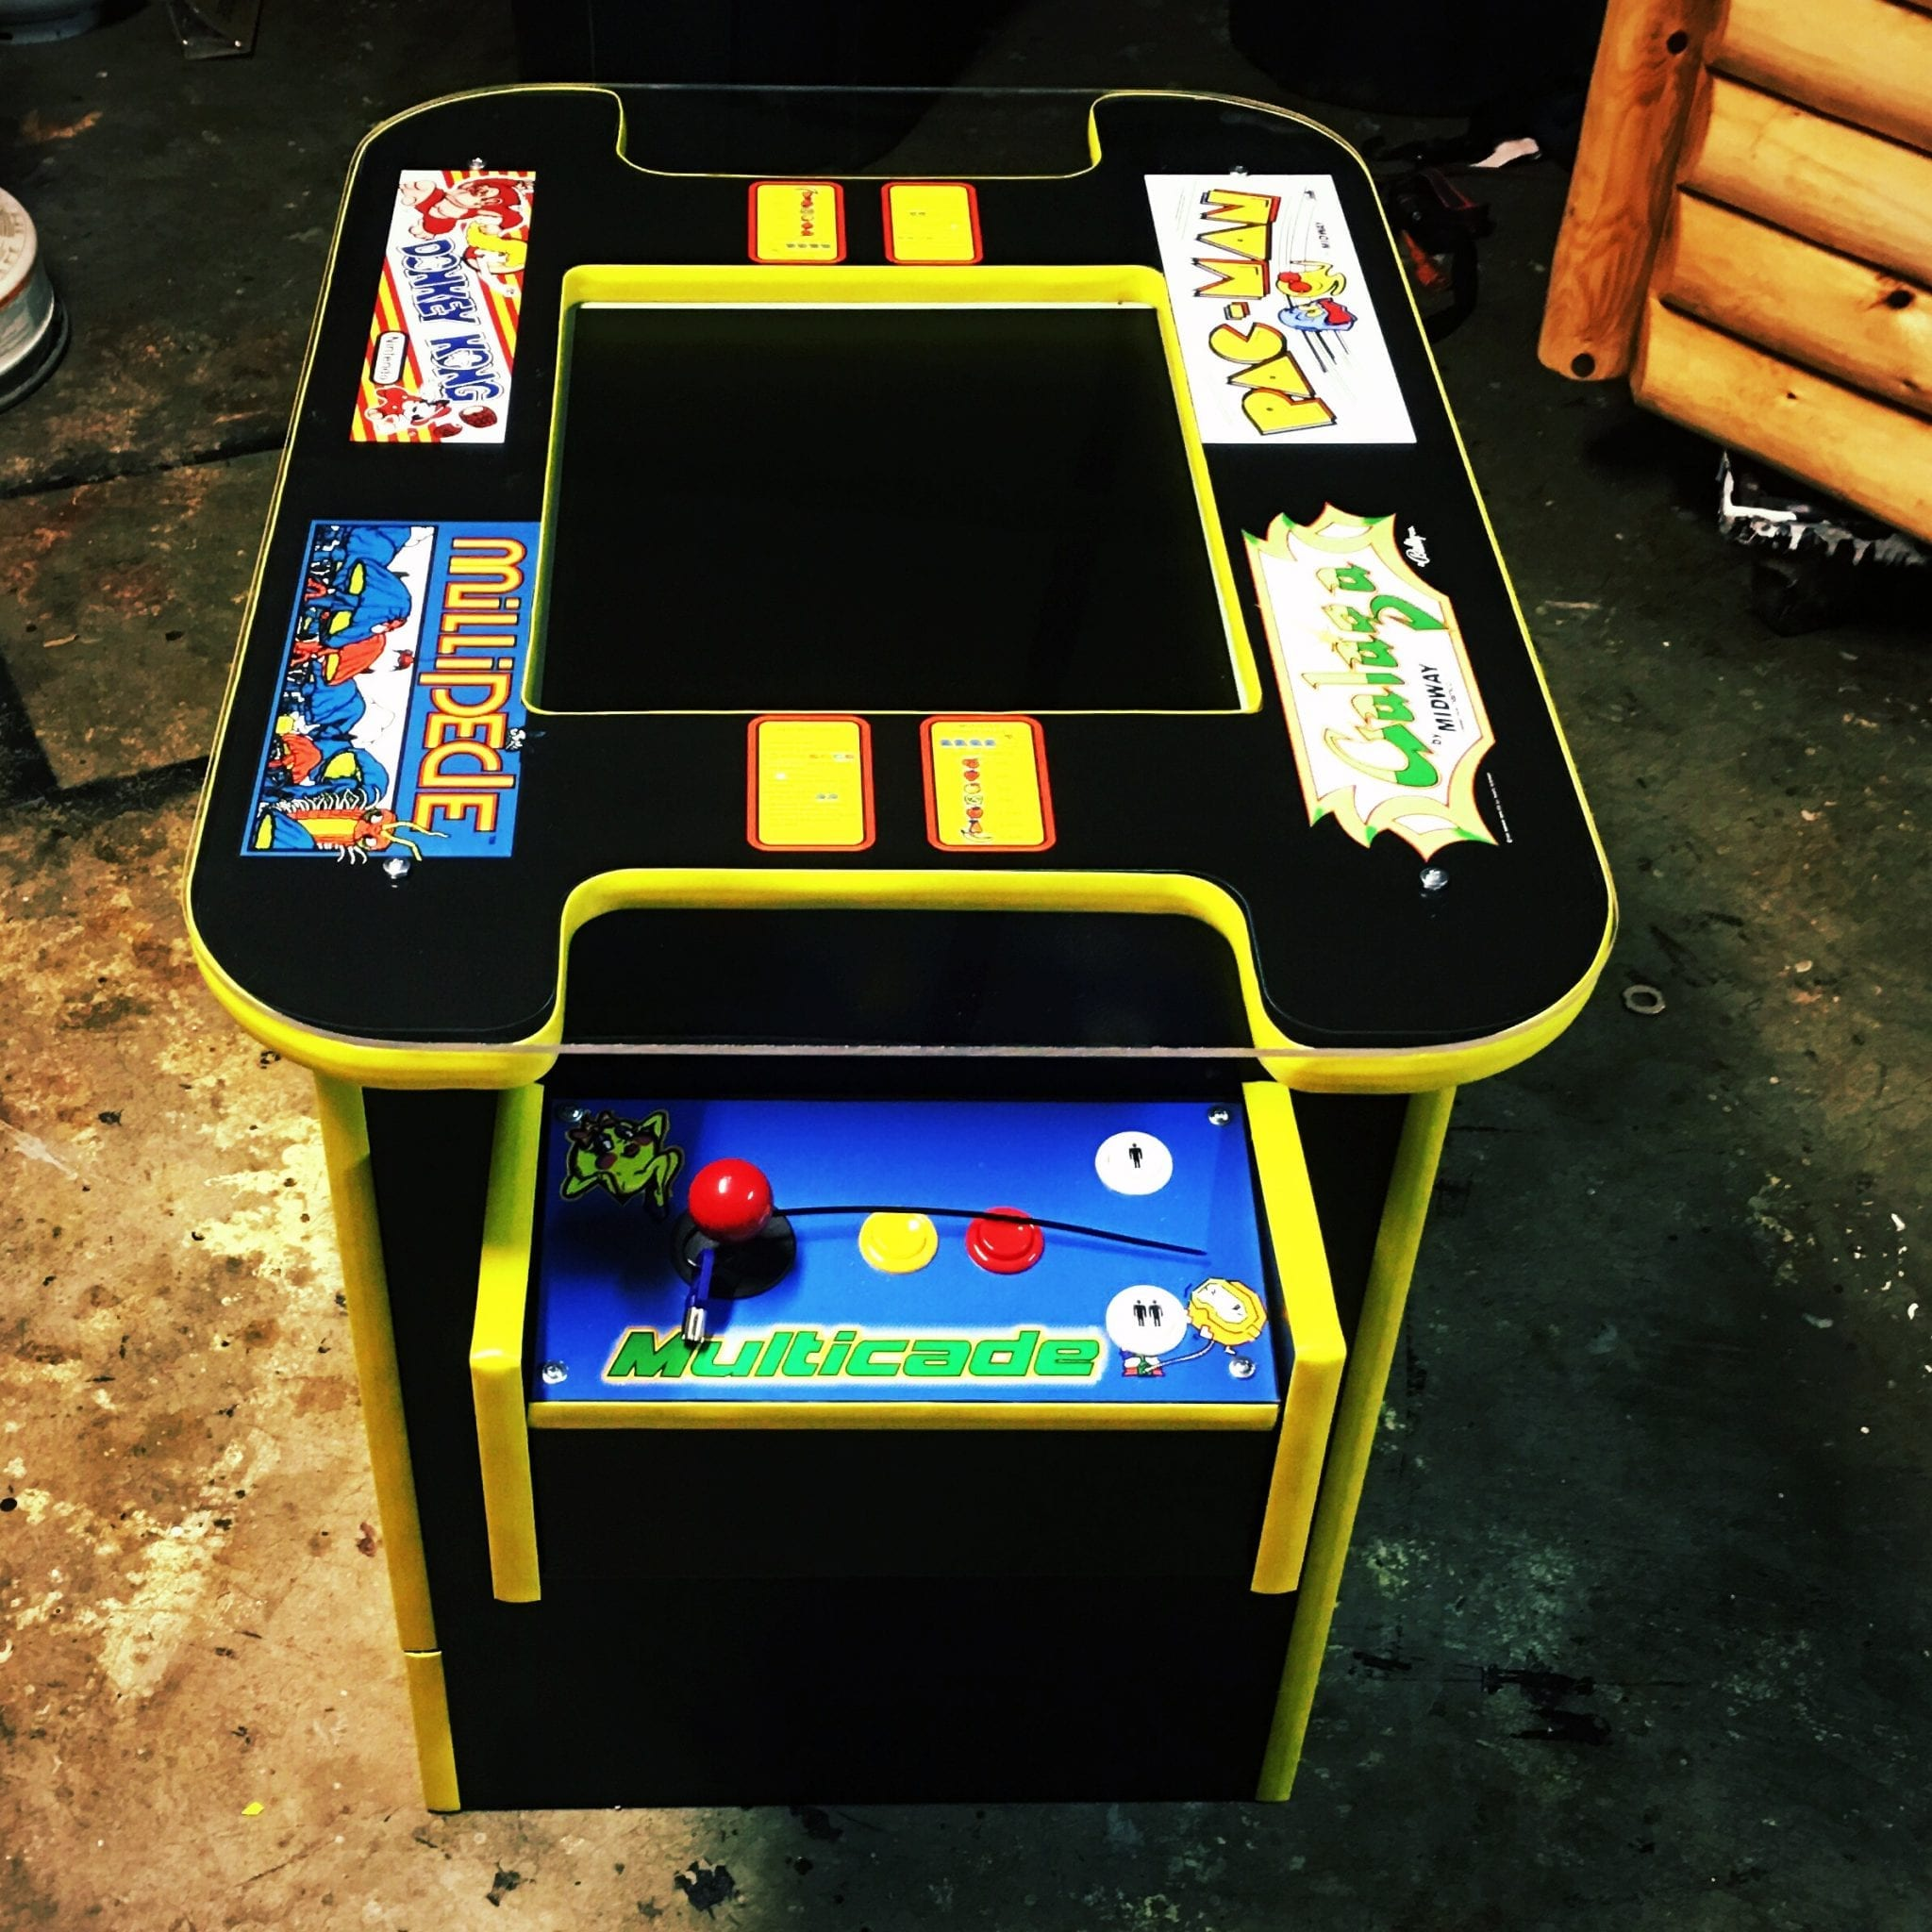 Cocktail 60 in 1 Classic Arcade Game Roomscene